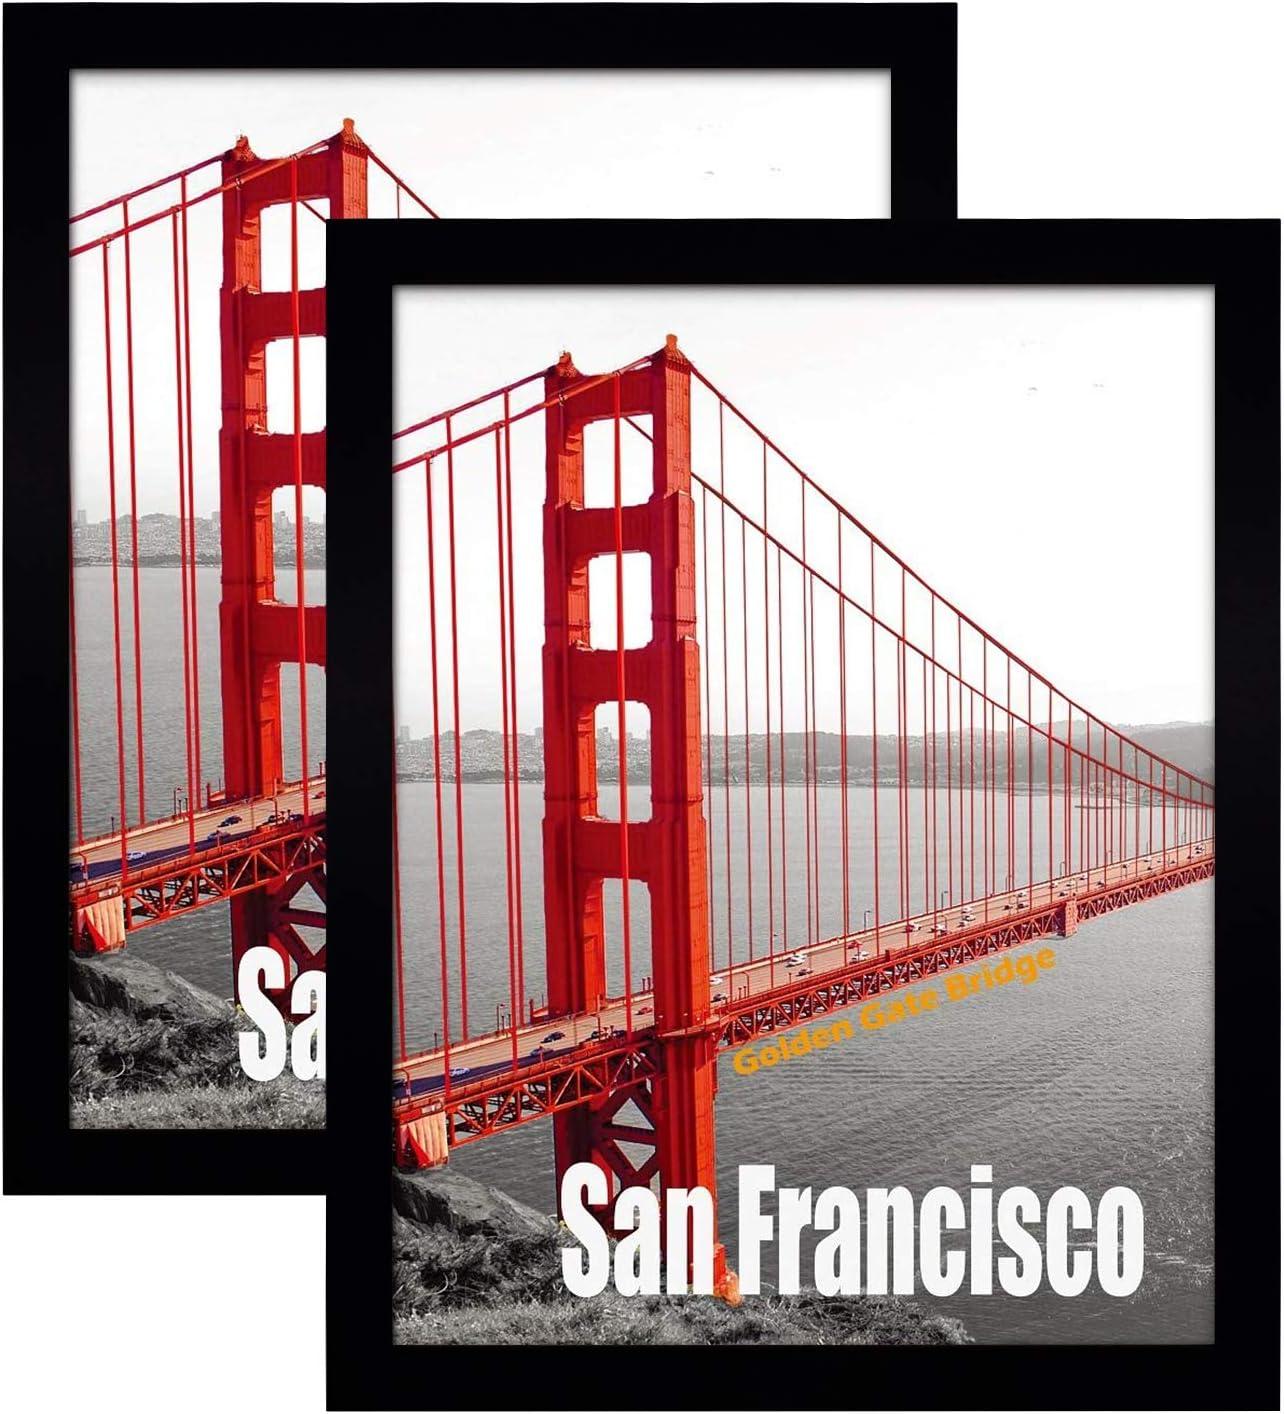 Frametory, Set of 2, 11X14 Pre-Assembled Black Poster Frame - Golden Gate Bridge Gallery Edition